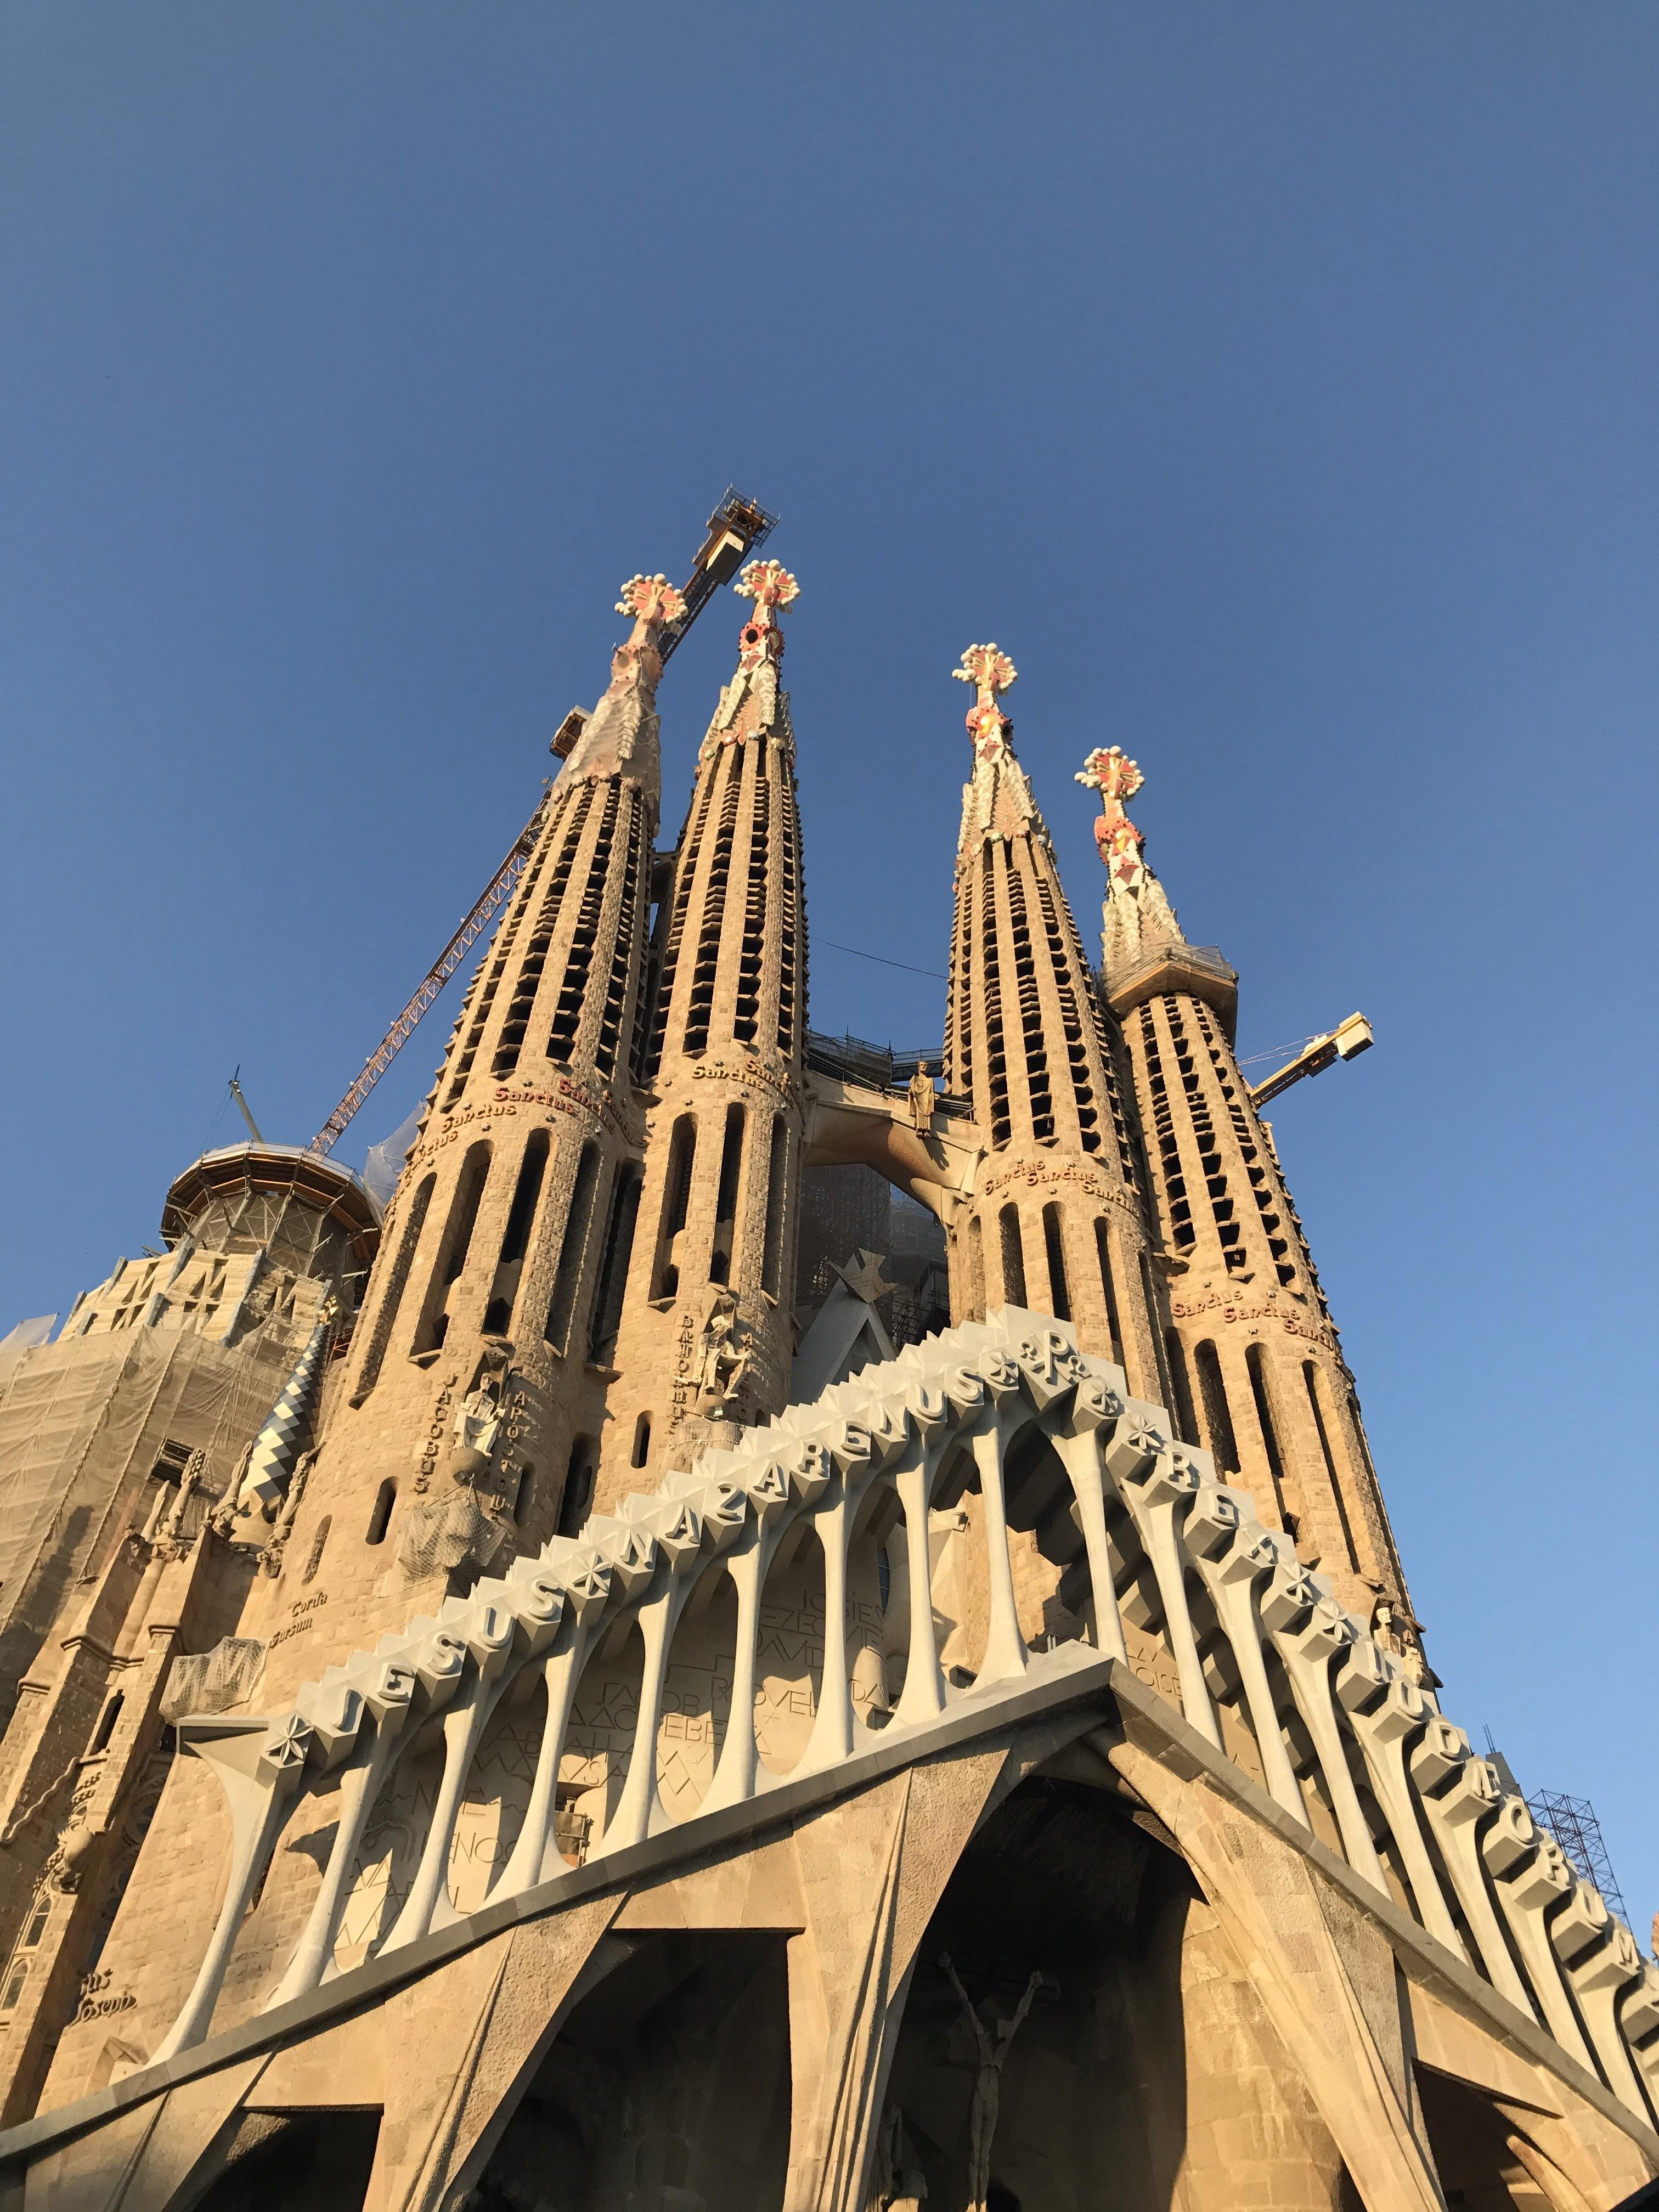 Sagrada Familia Barcelona. #travel #ttot #nature #photo #vacation #Hotel #adventure #landscape http://bit.ly/2sgGGF7